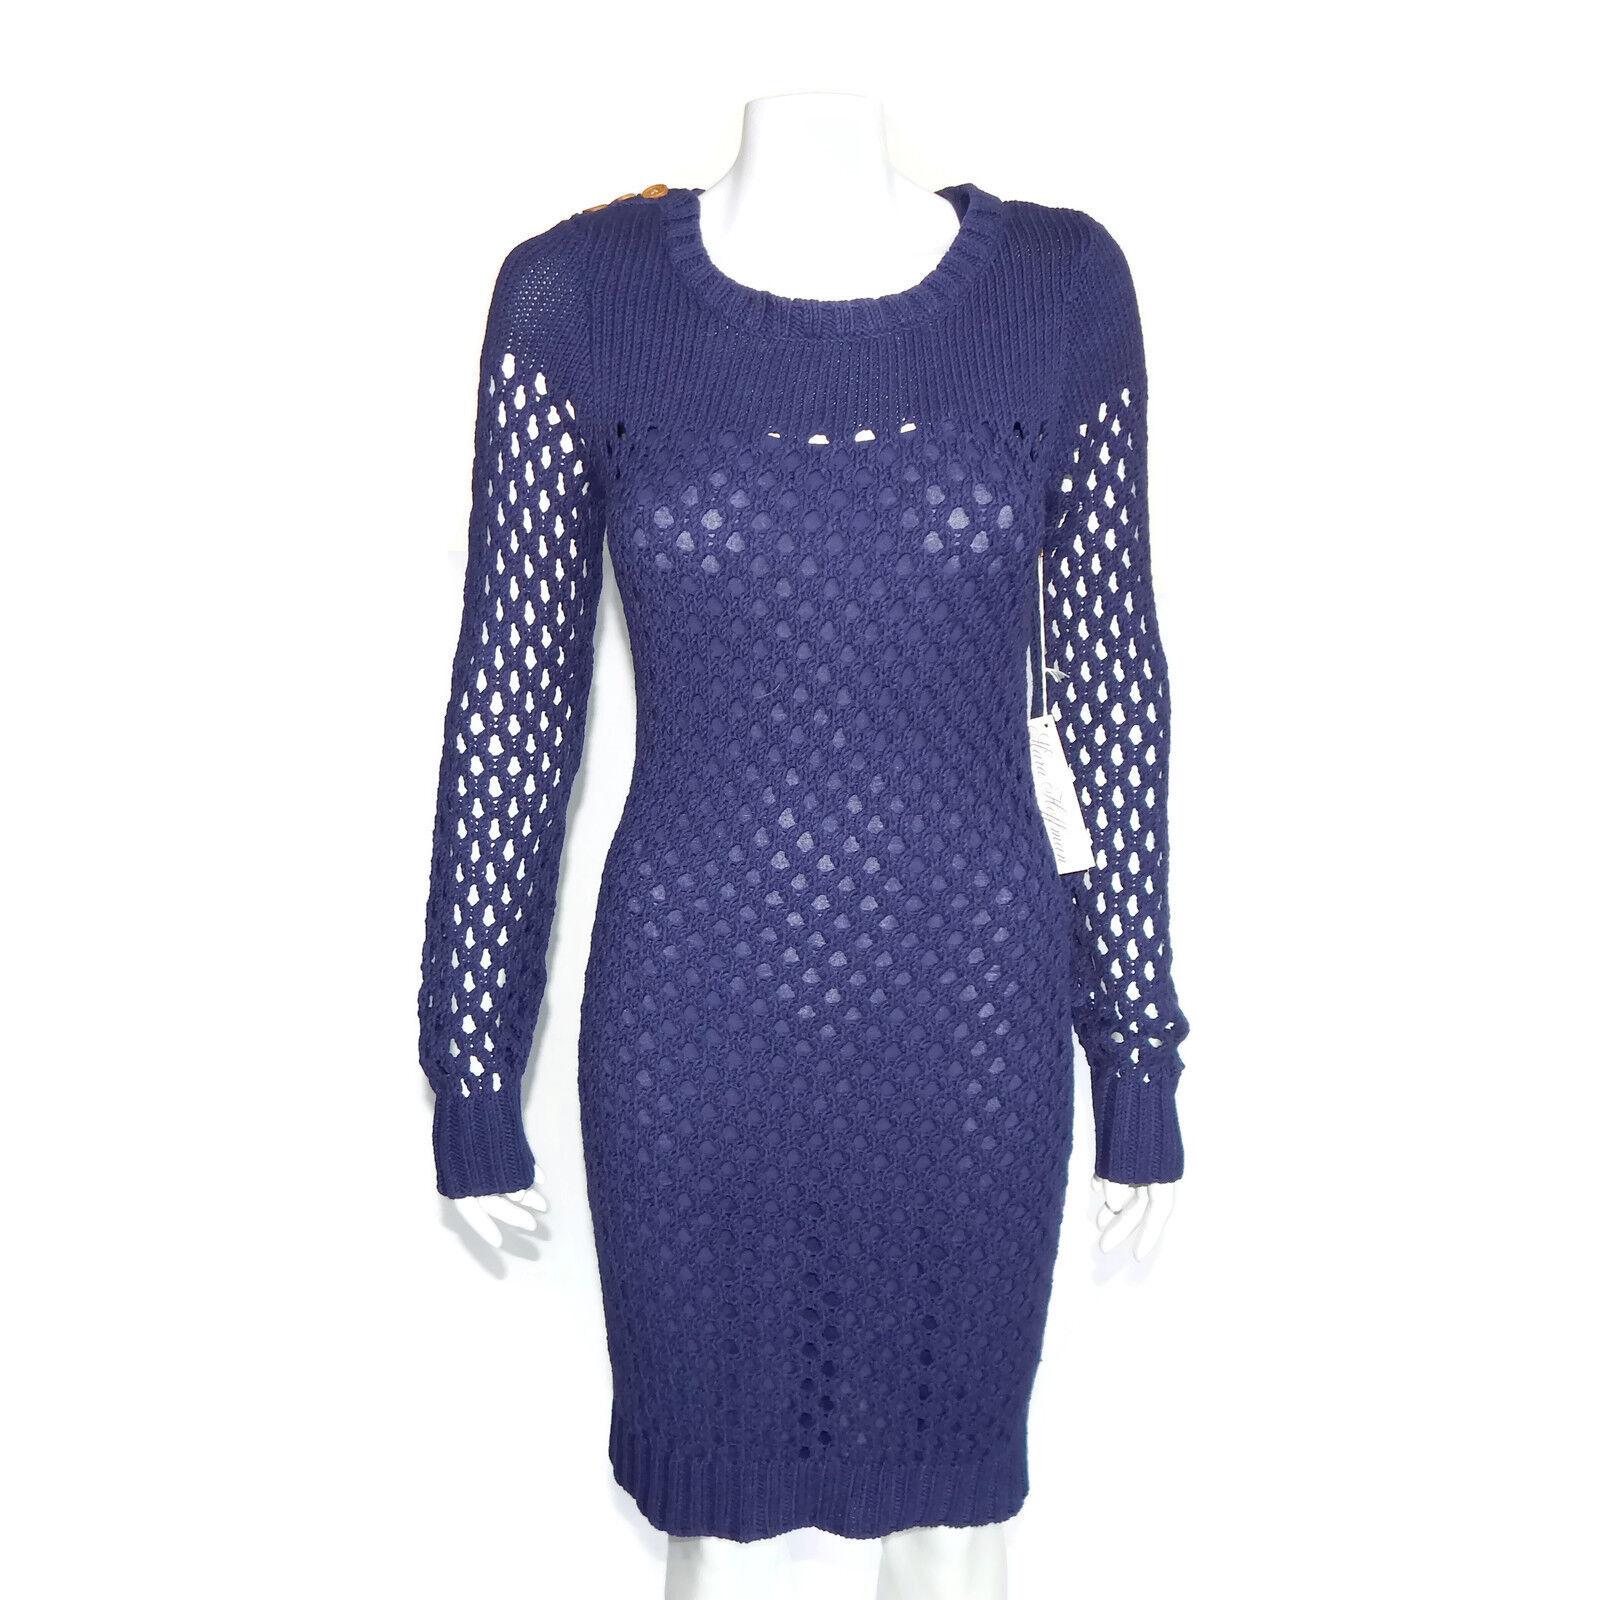 New Mara Hoffman Royal bluee Purple Eyelet Knit Bodycon Dress Size Large